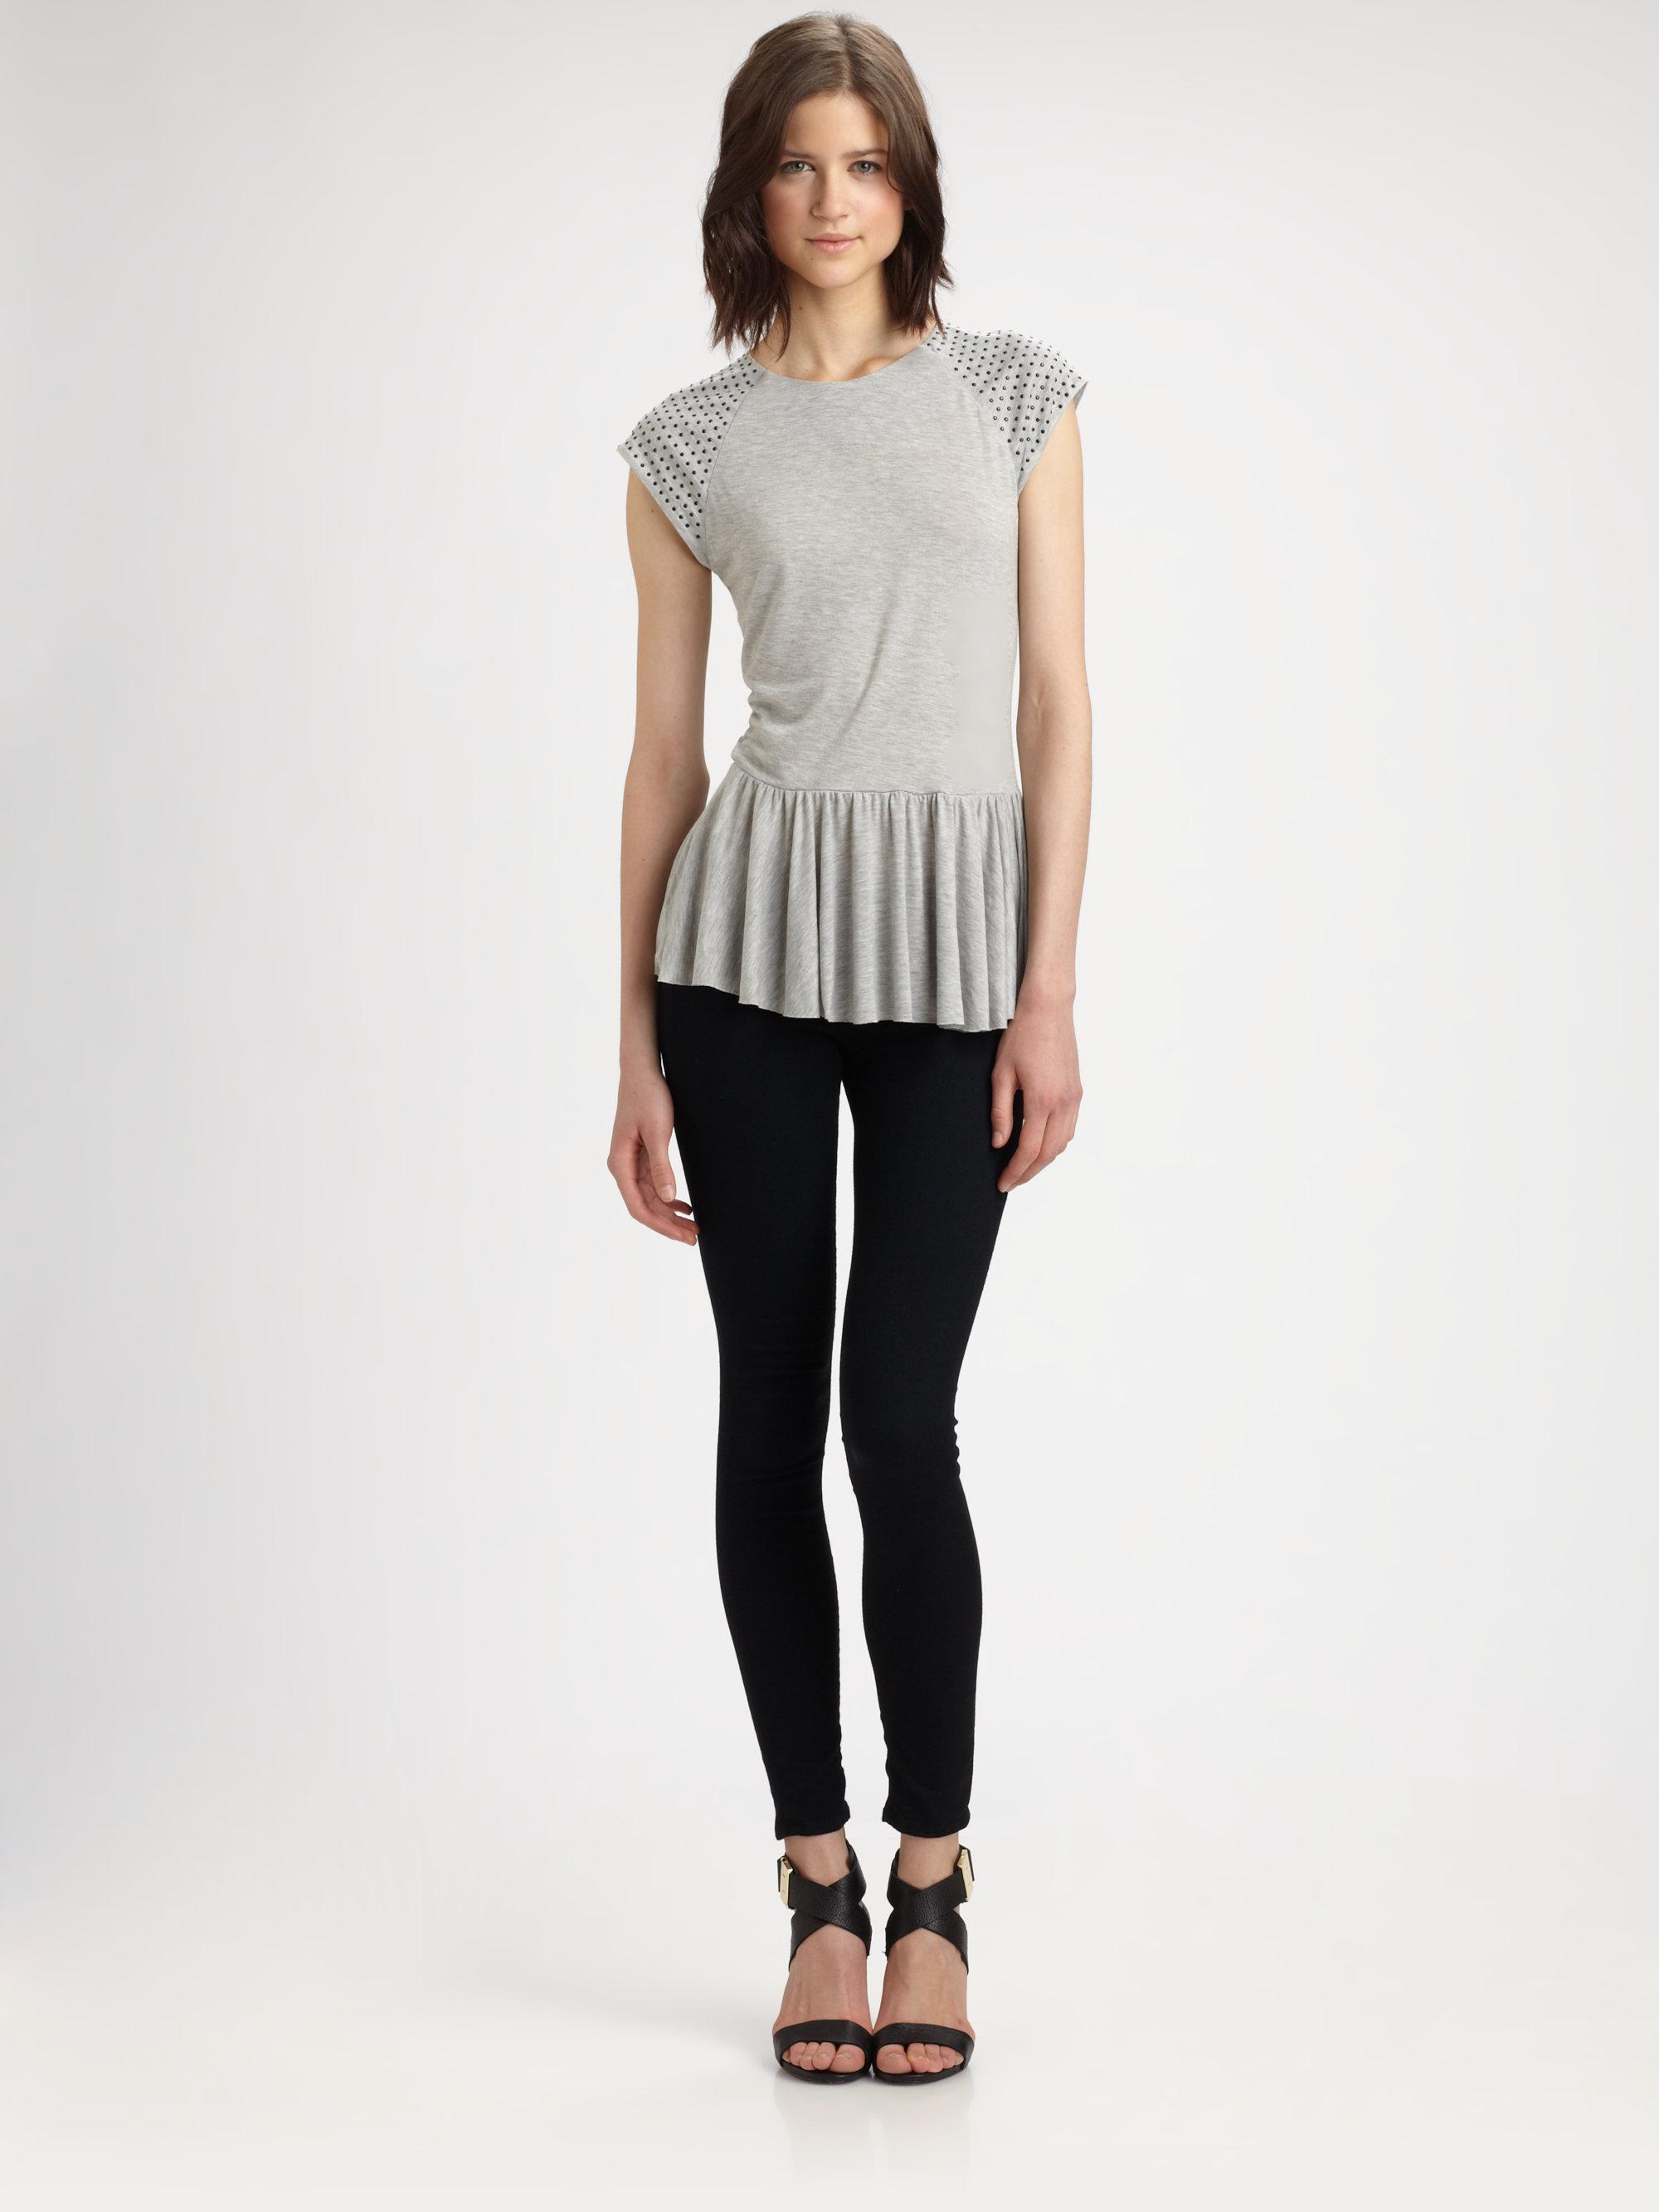 Lyst Rebecca Taylor Nailhead Peplum Tshirt In Gray